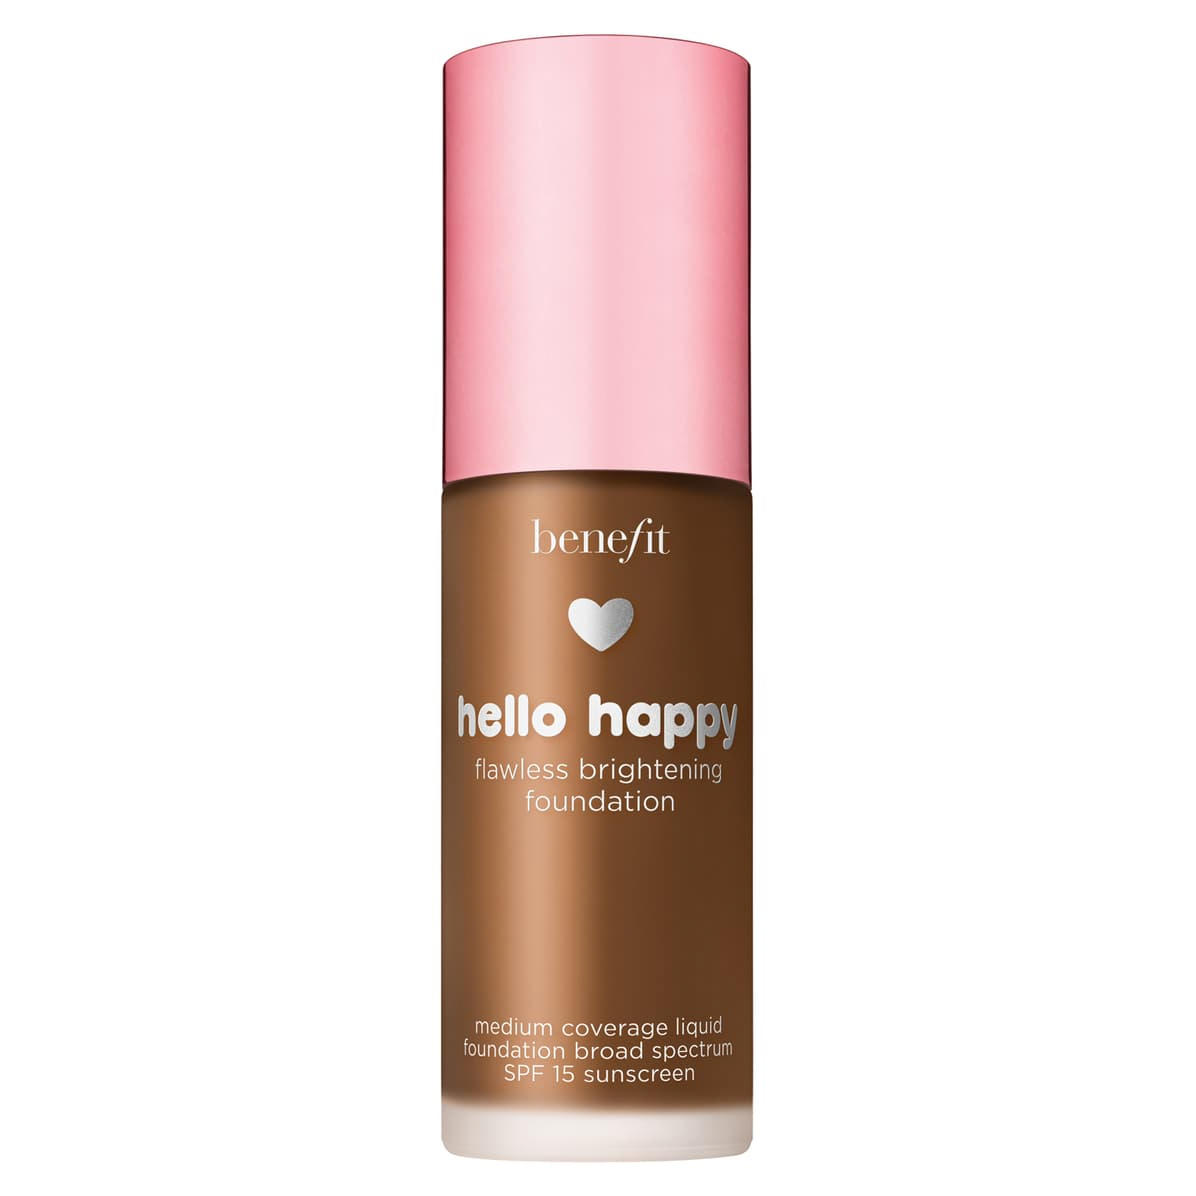 Benefit Hello Happy Flawless Brightening Foundation 12